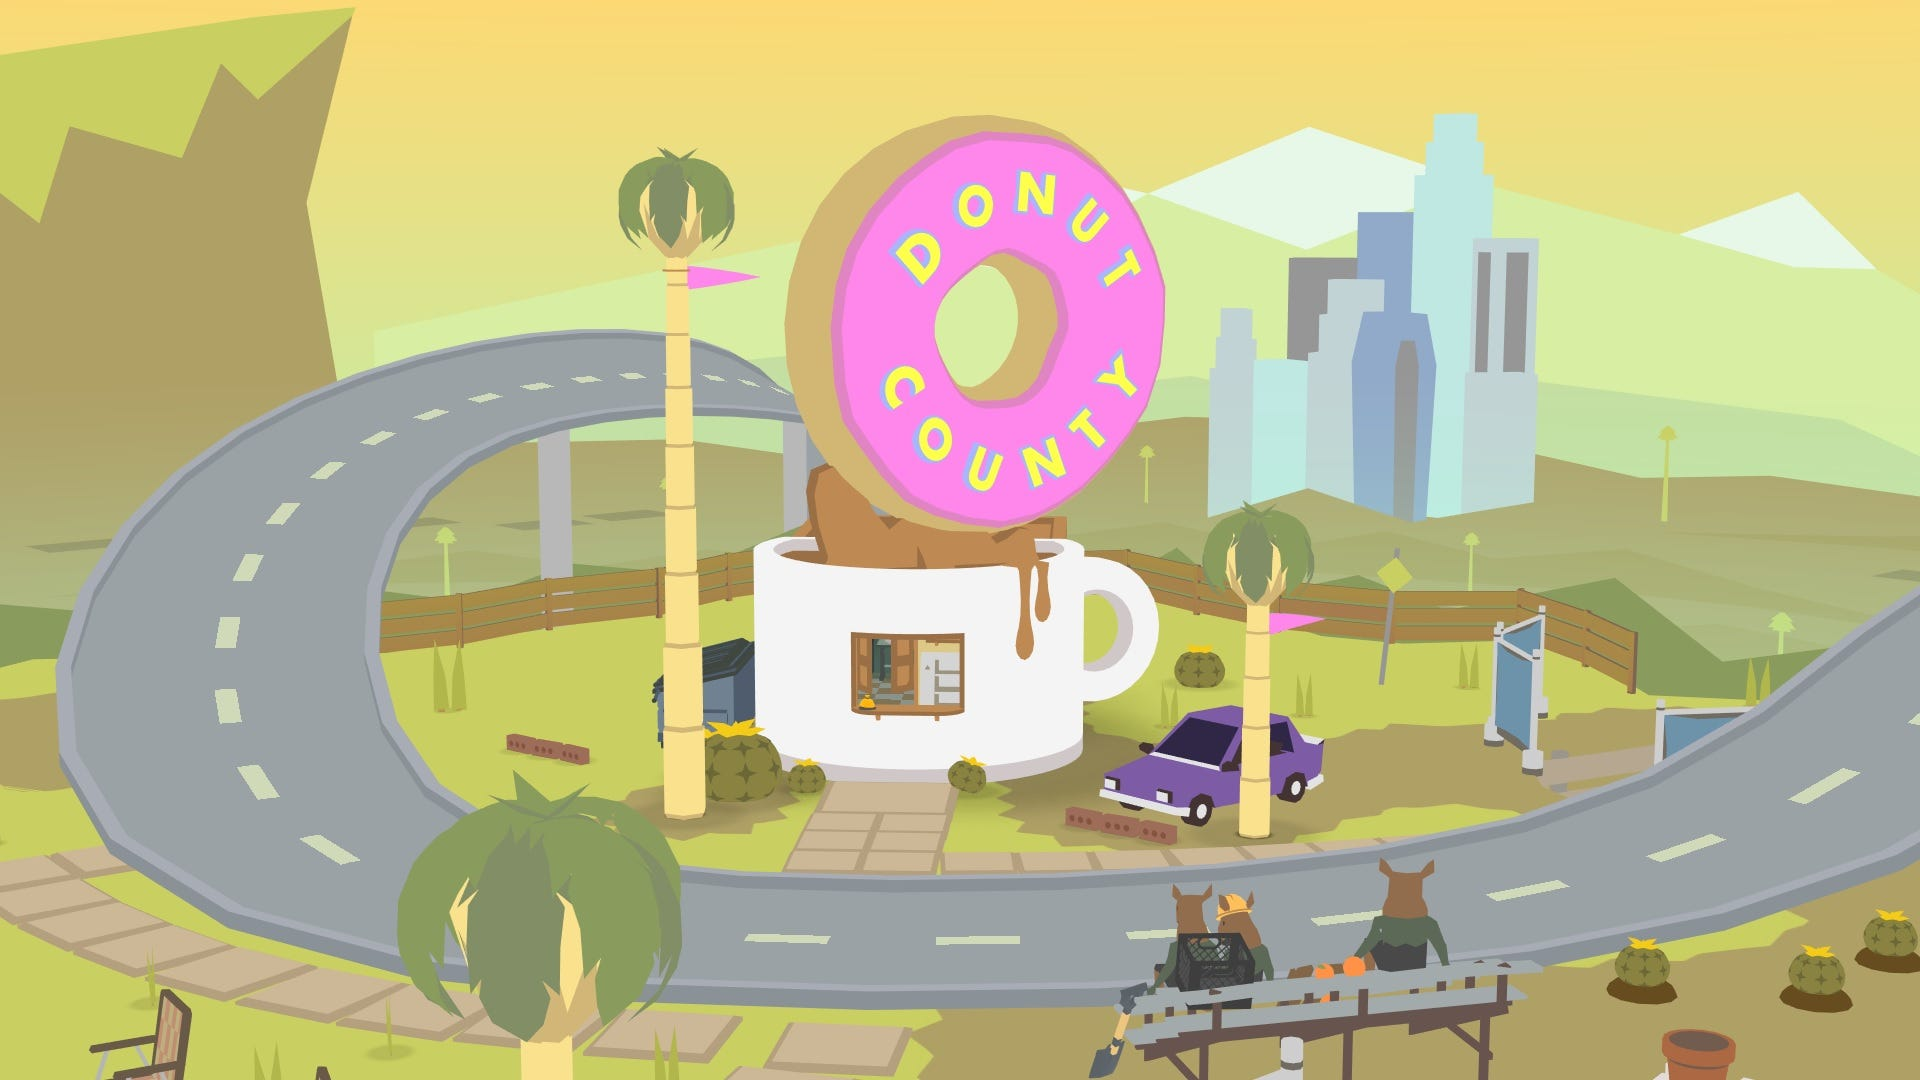 Donut County highway coffee shop